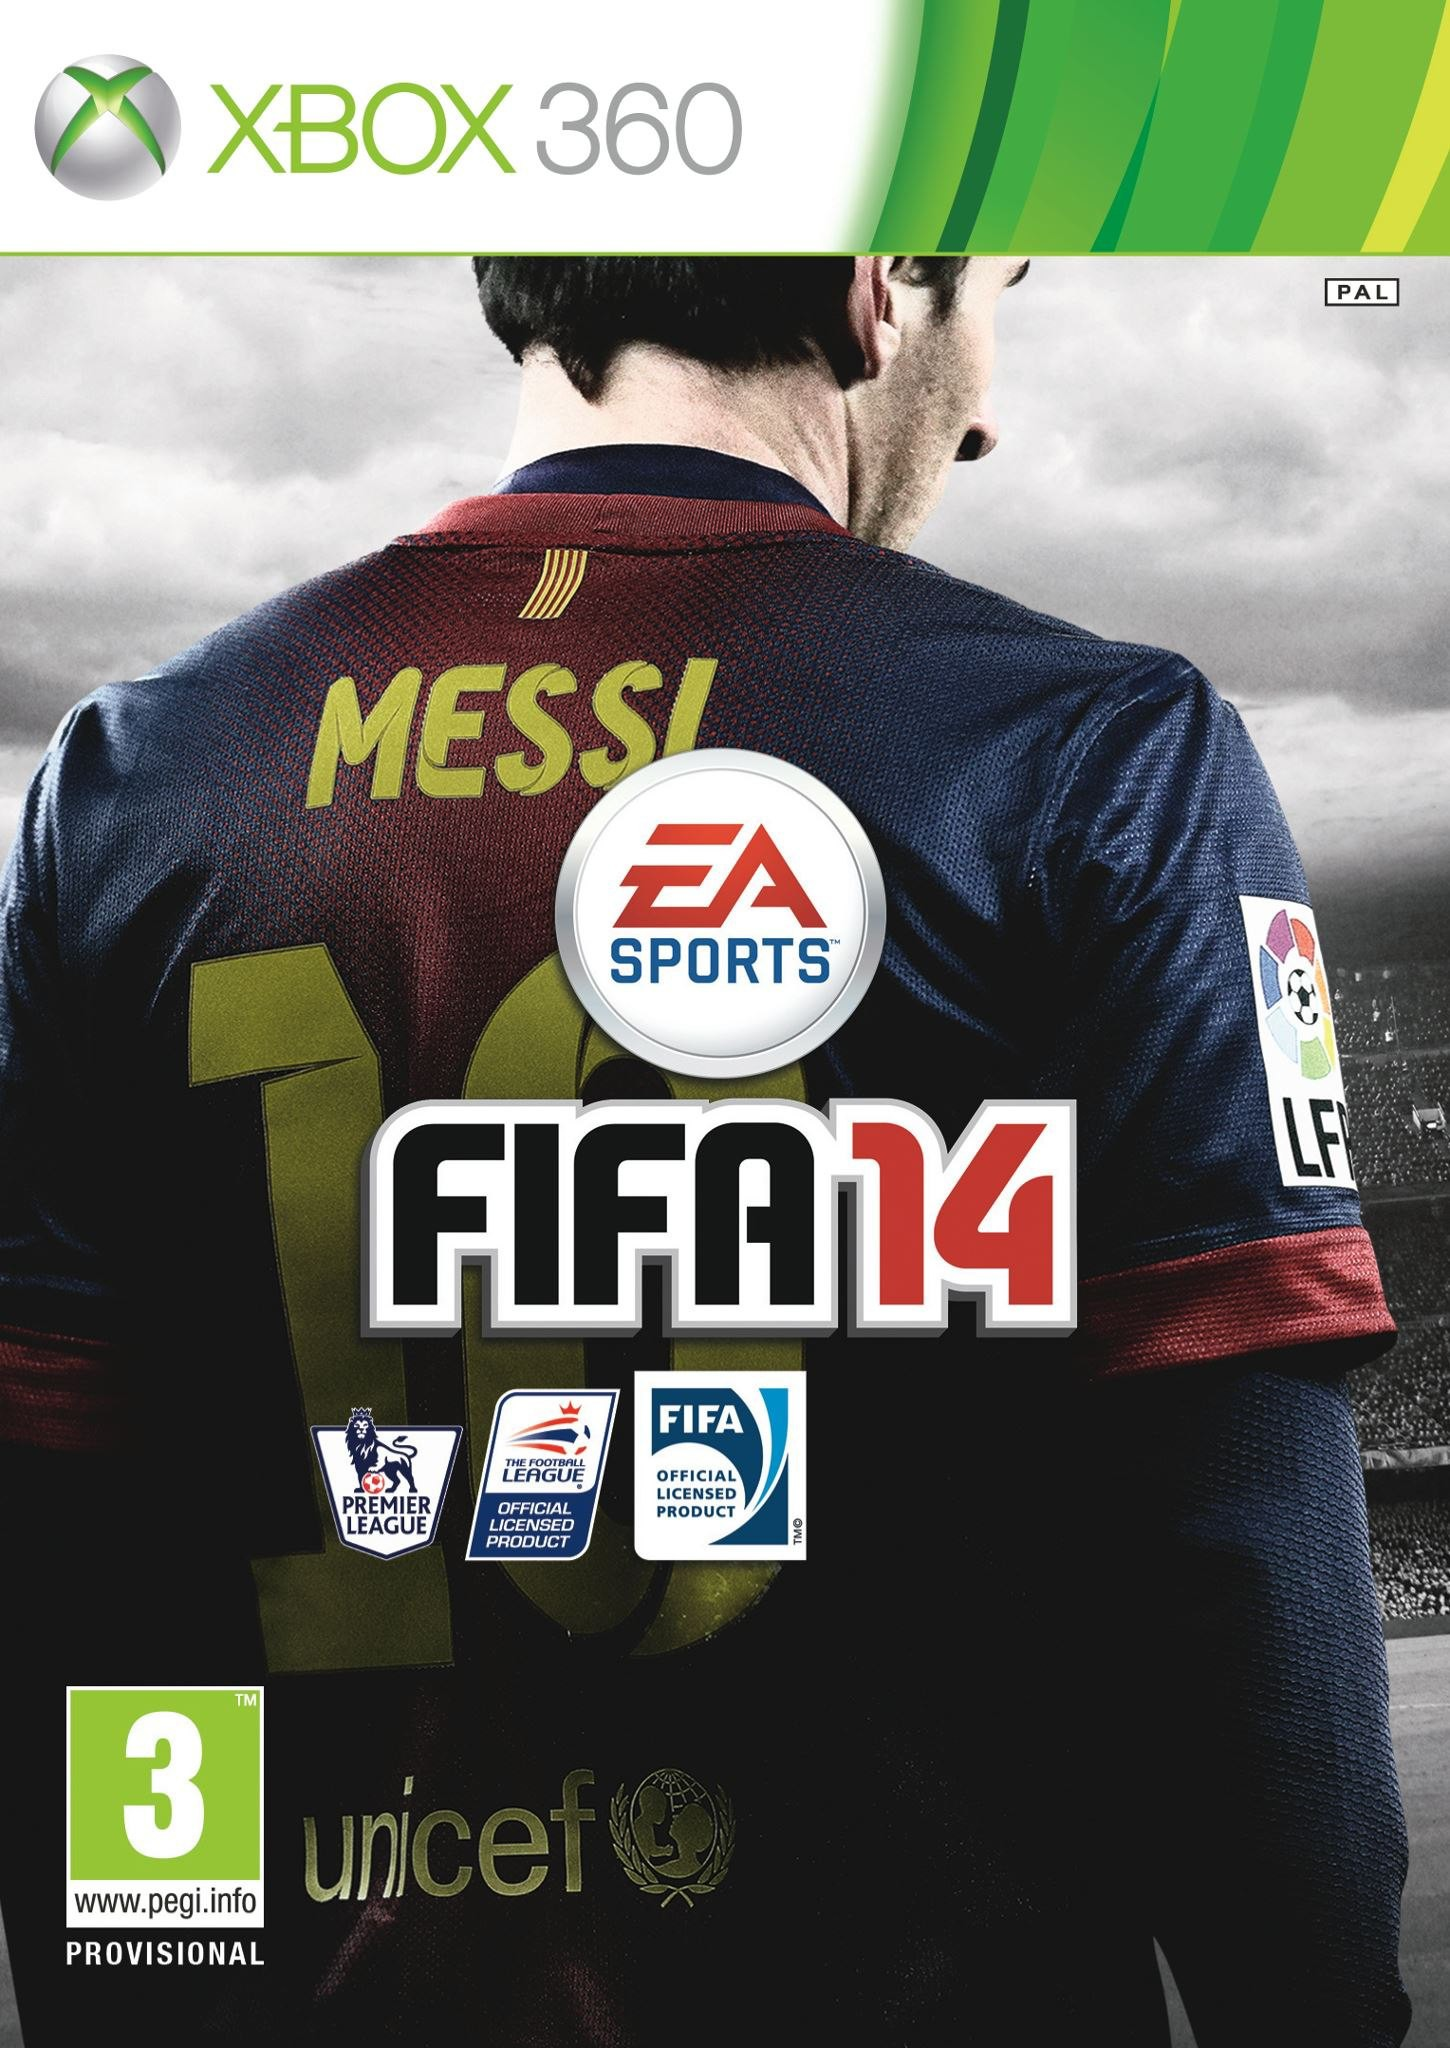 FIFA 14, Xbox 360